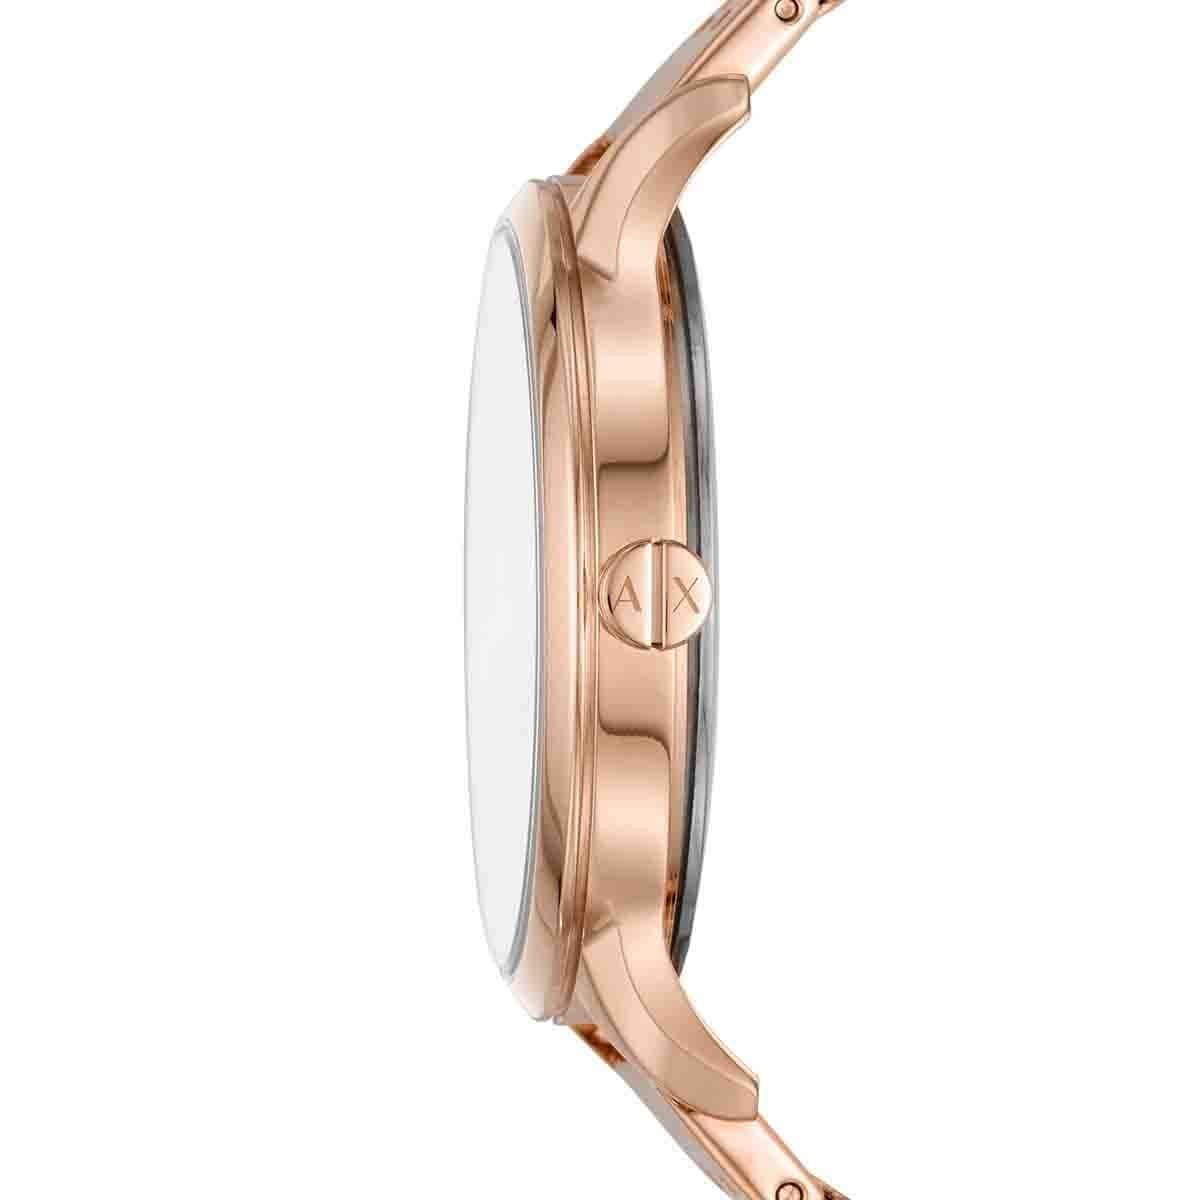 026f3405bec1 Reloj para dama color oro rosado armani exchange